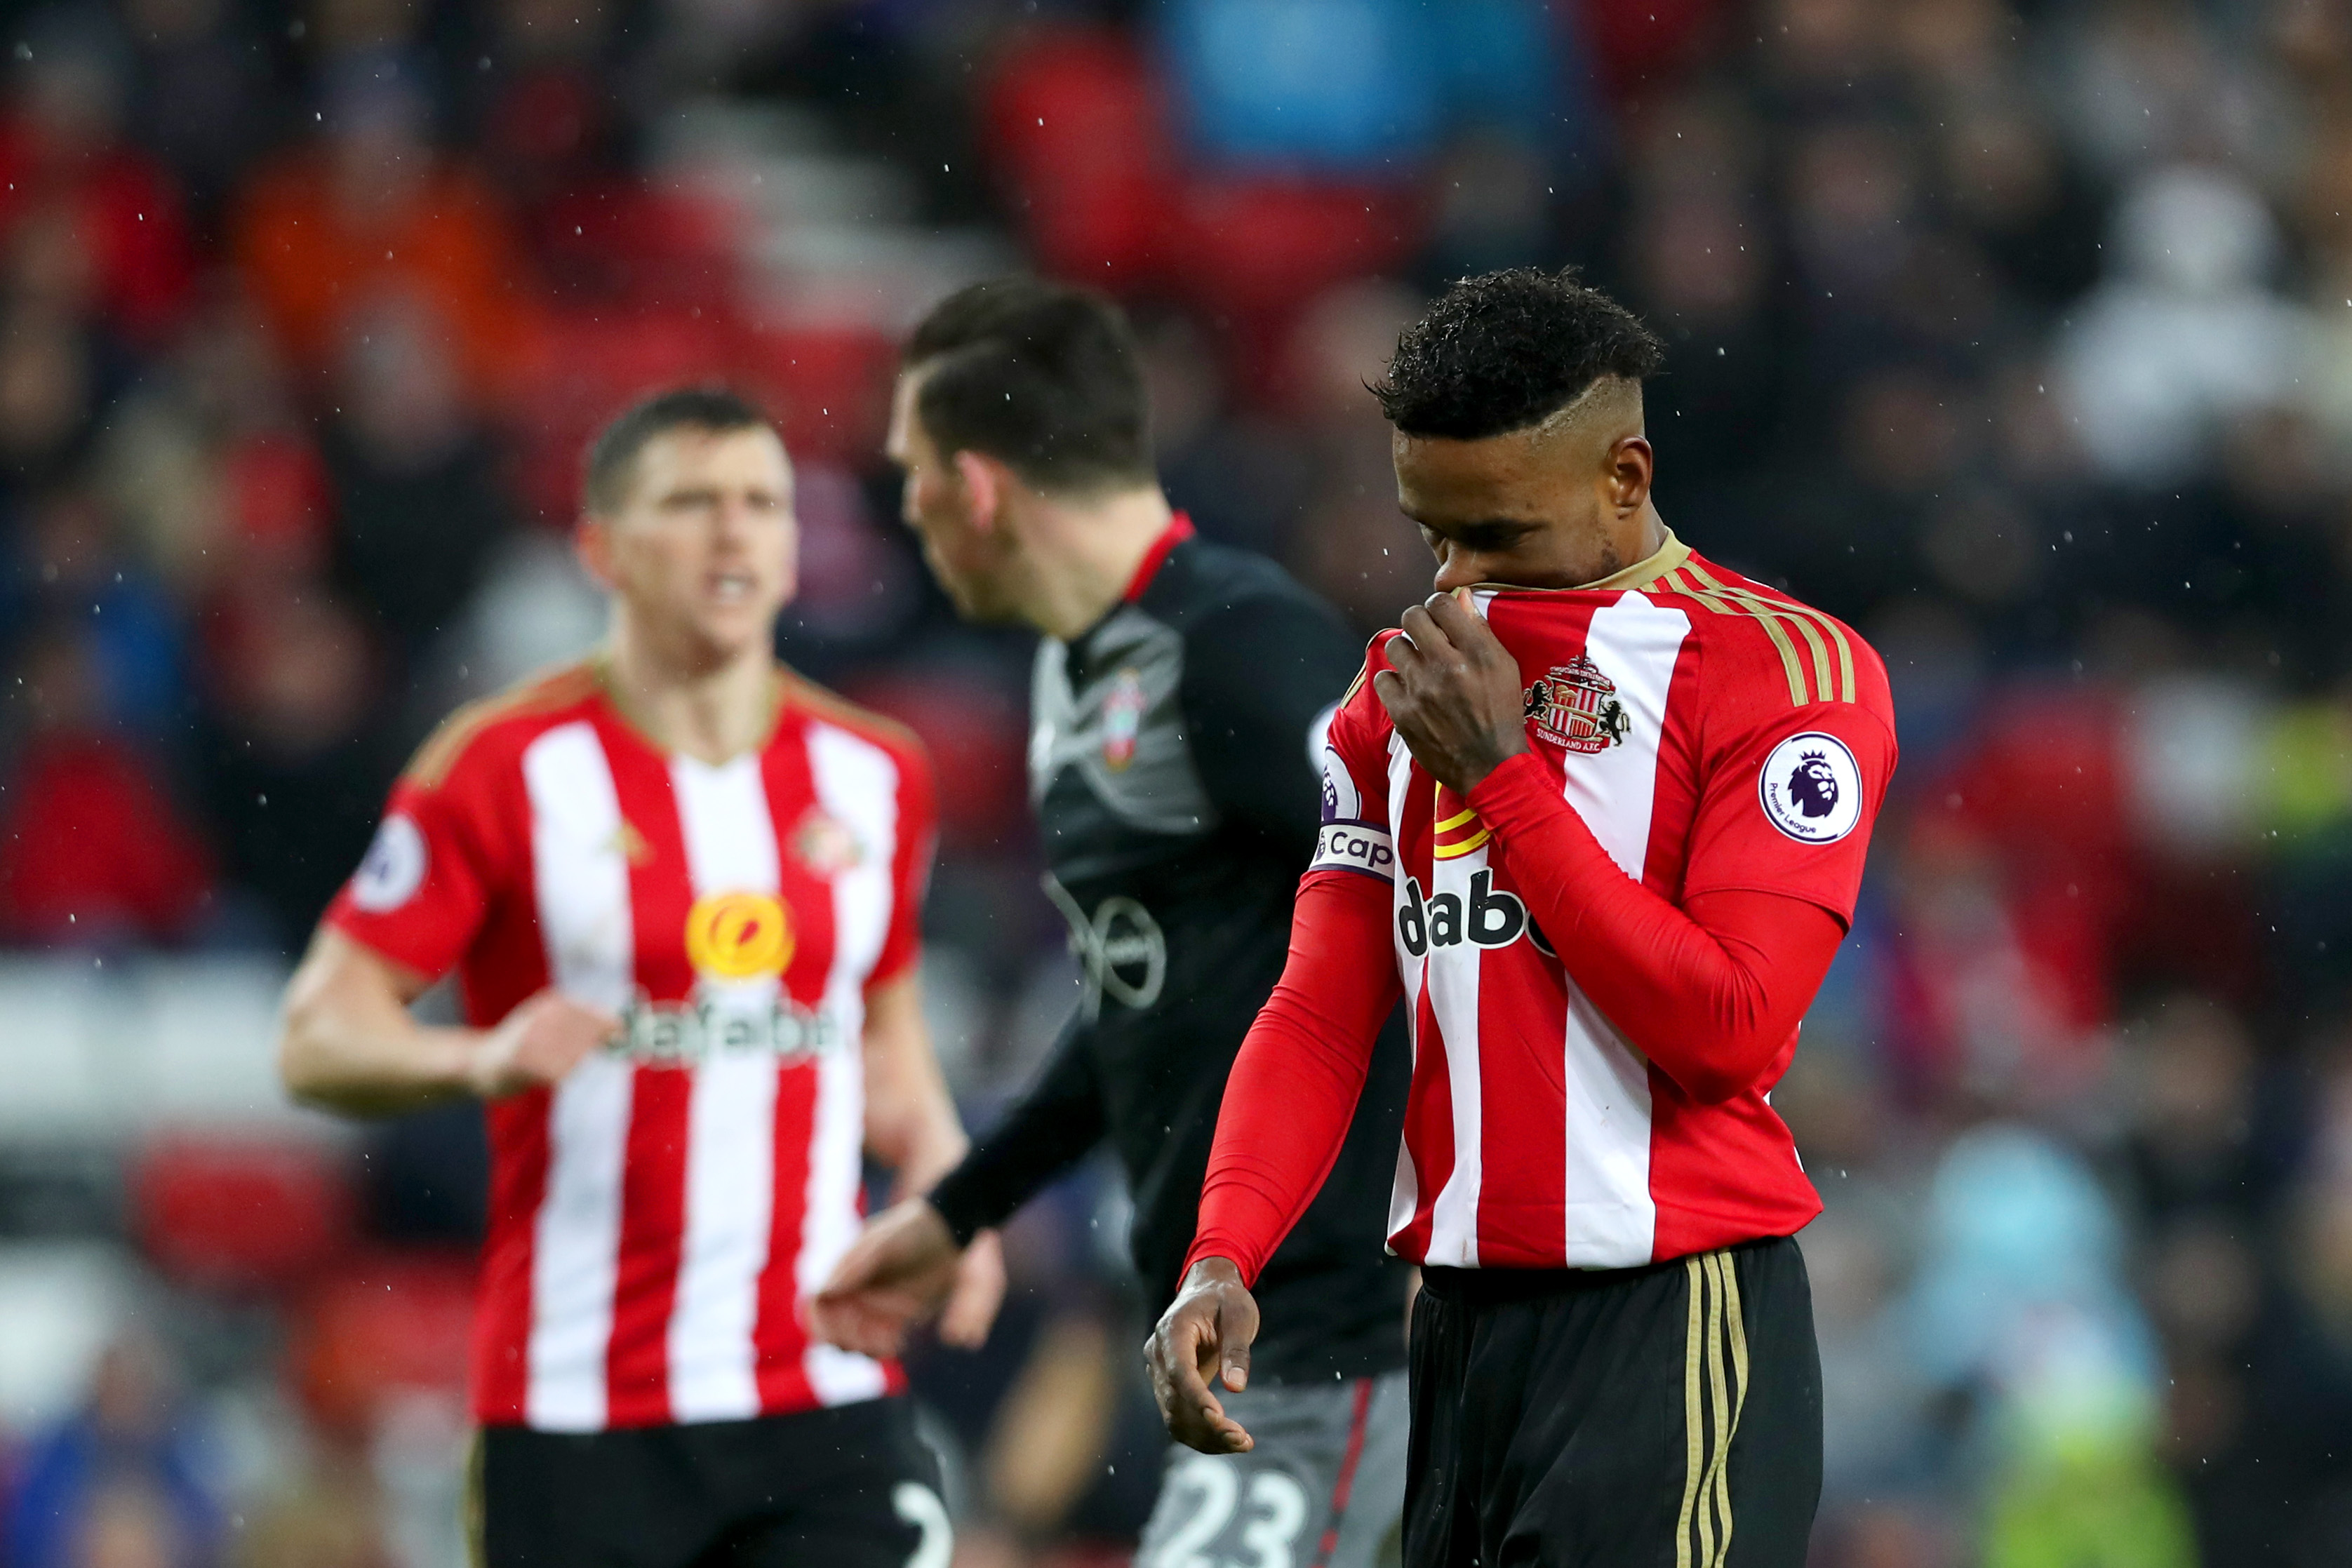 Moyes hopes to take advantage of Southampton's focus on Wembley